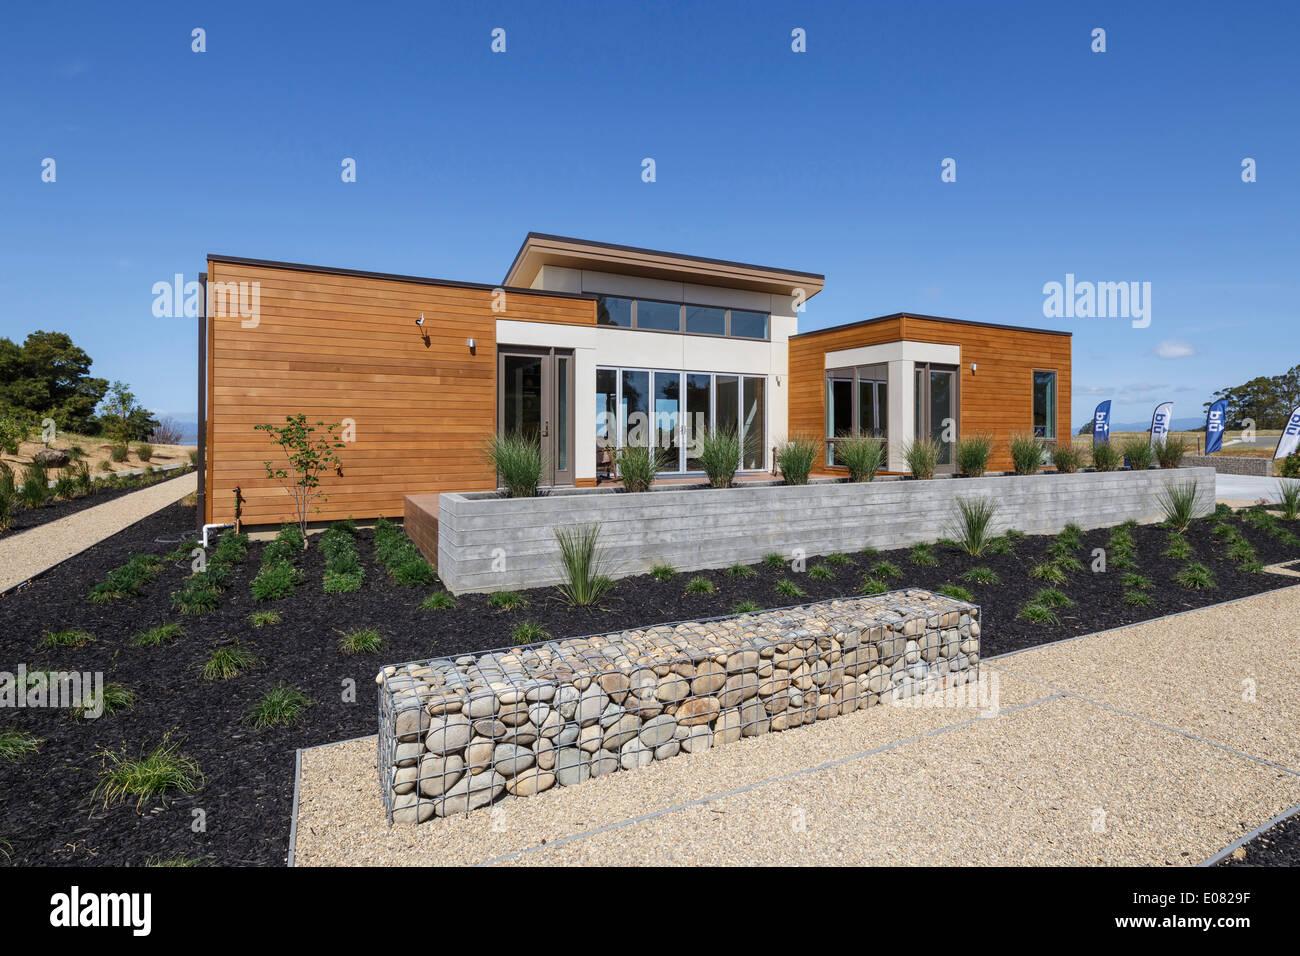 Blu homes model prefab home on mare island in vallejo ca